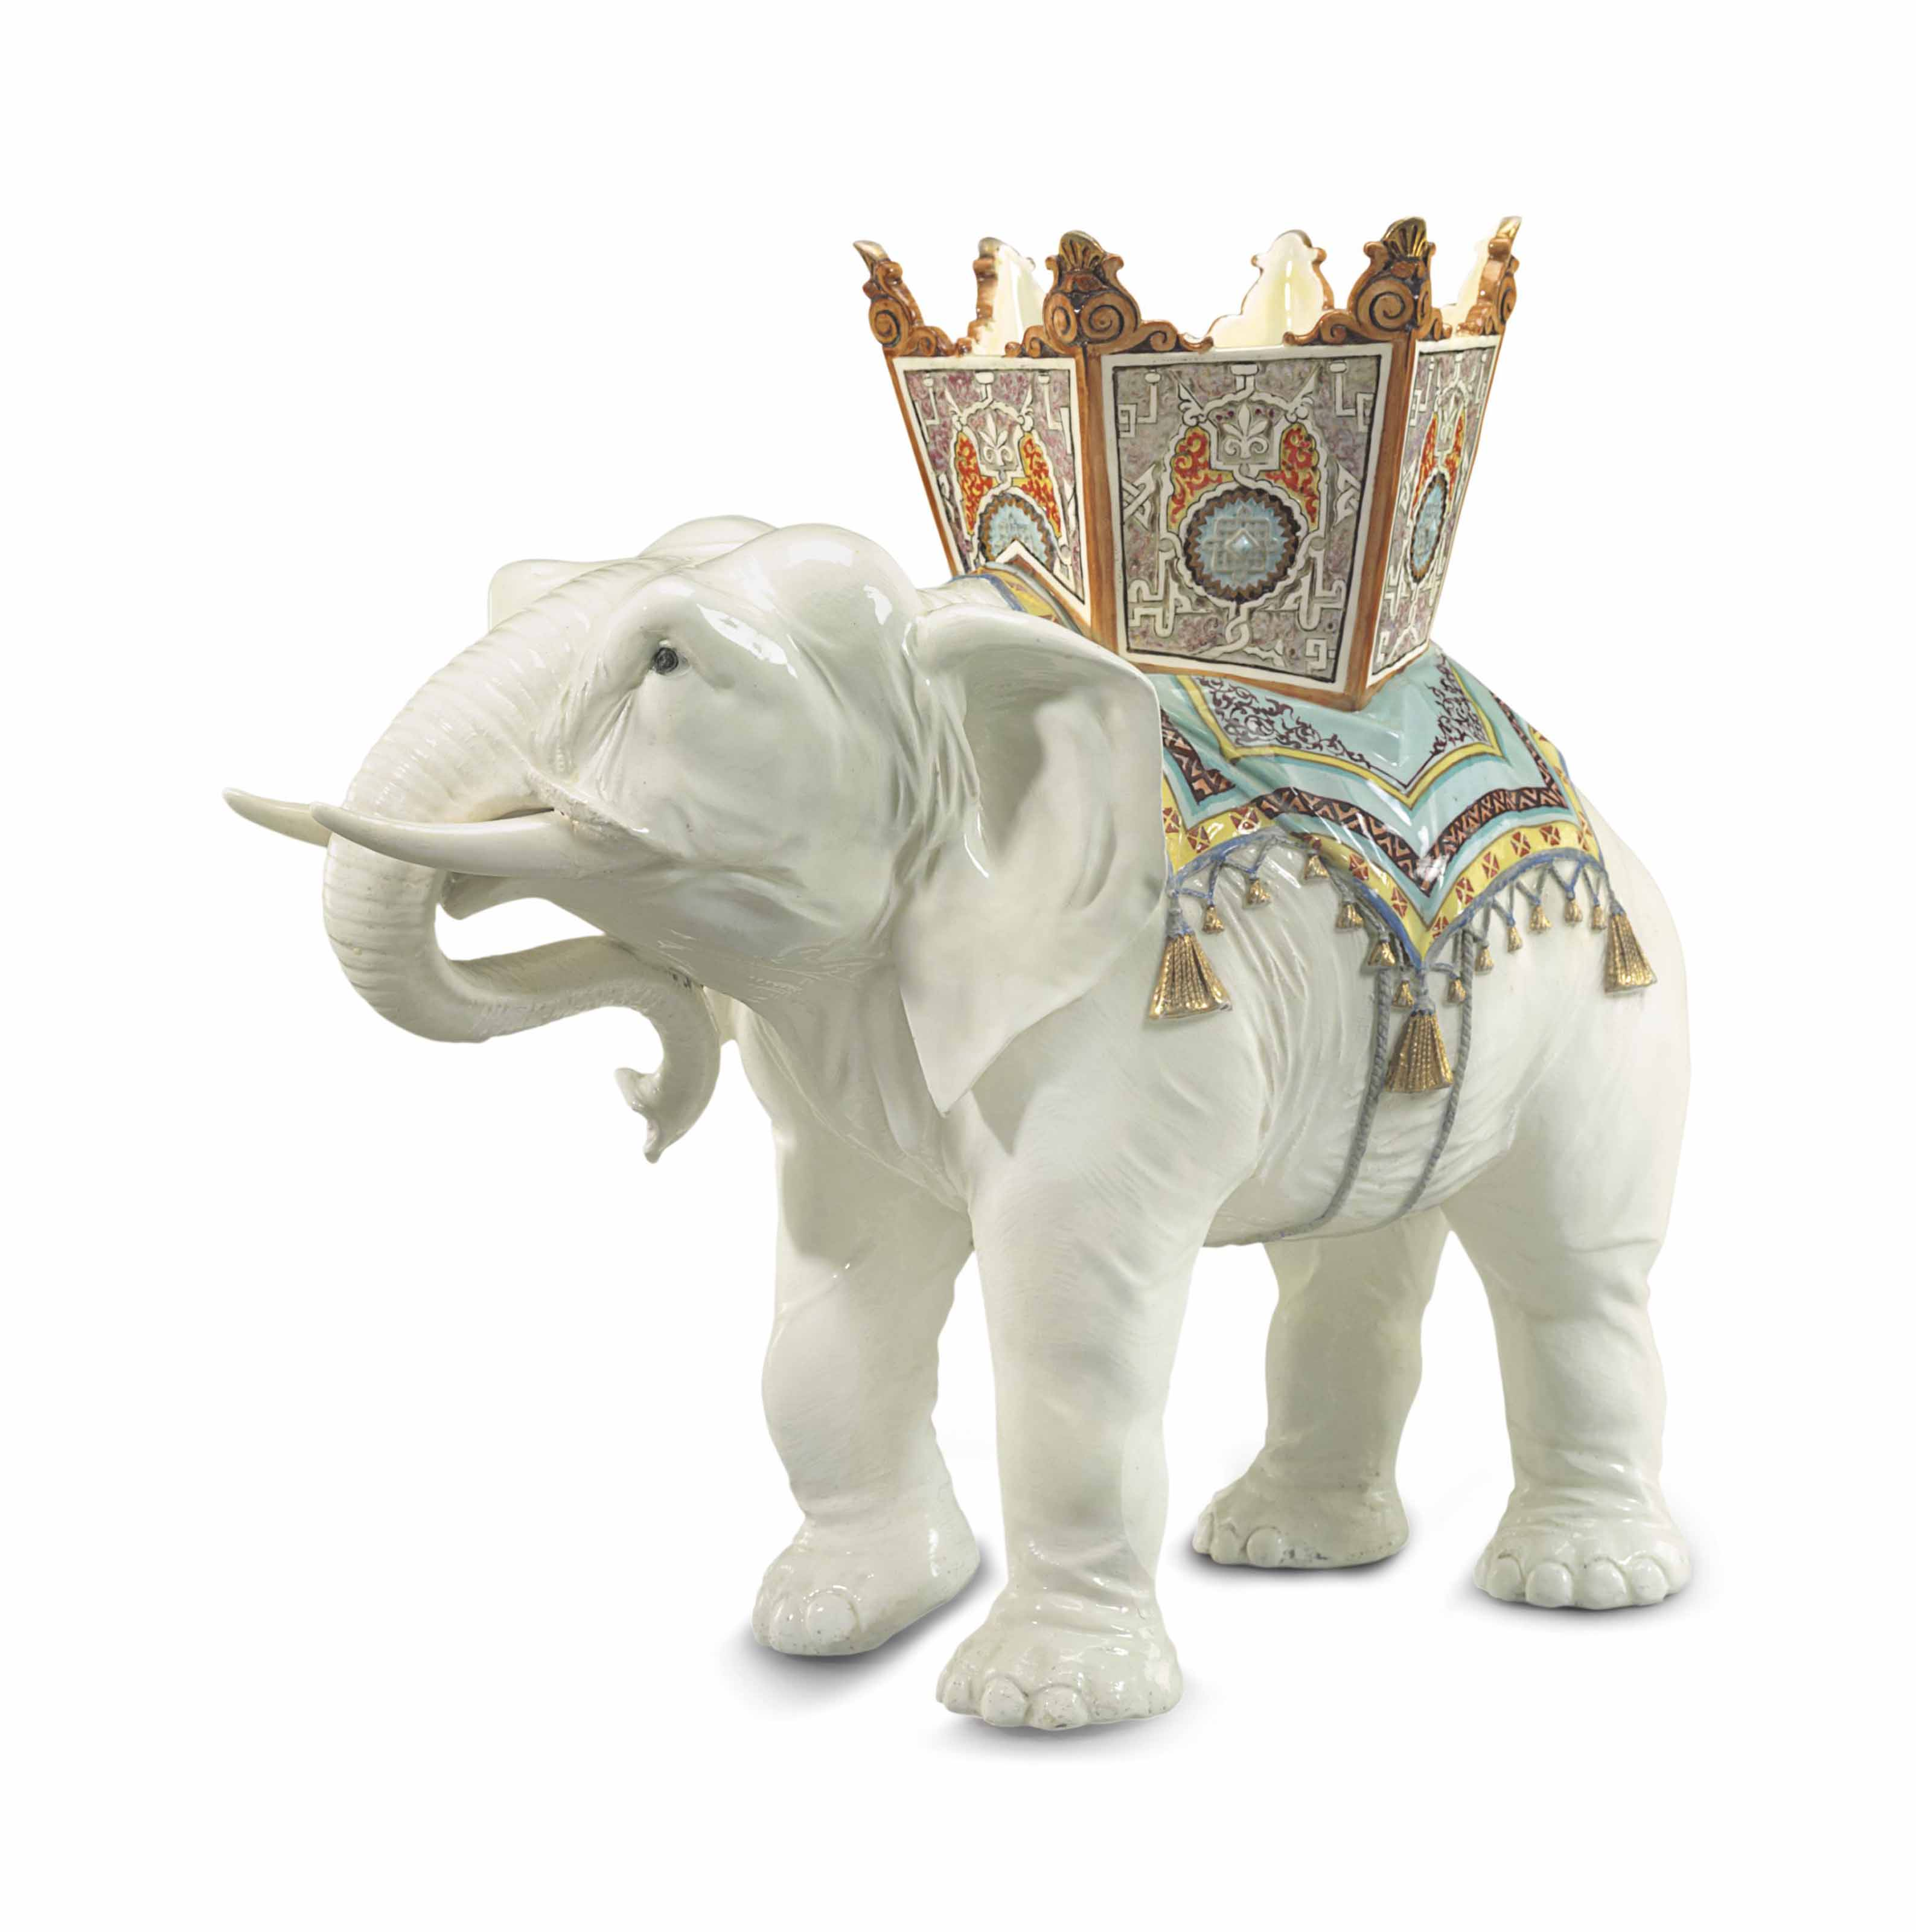 A LARGE MASSIER MAJOLICA ELEPHANT FORM JARDINIERE